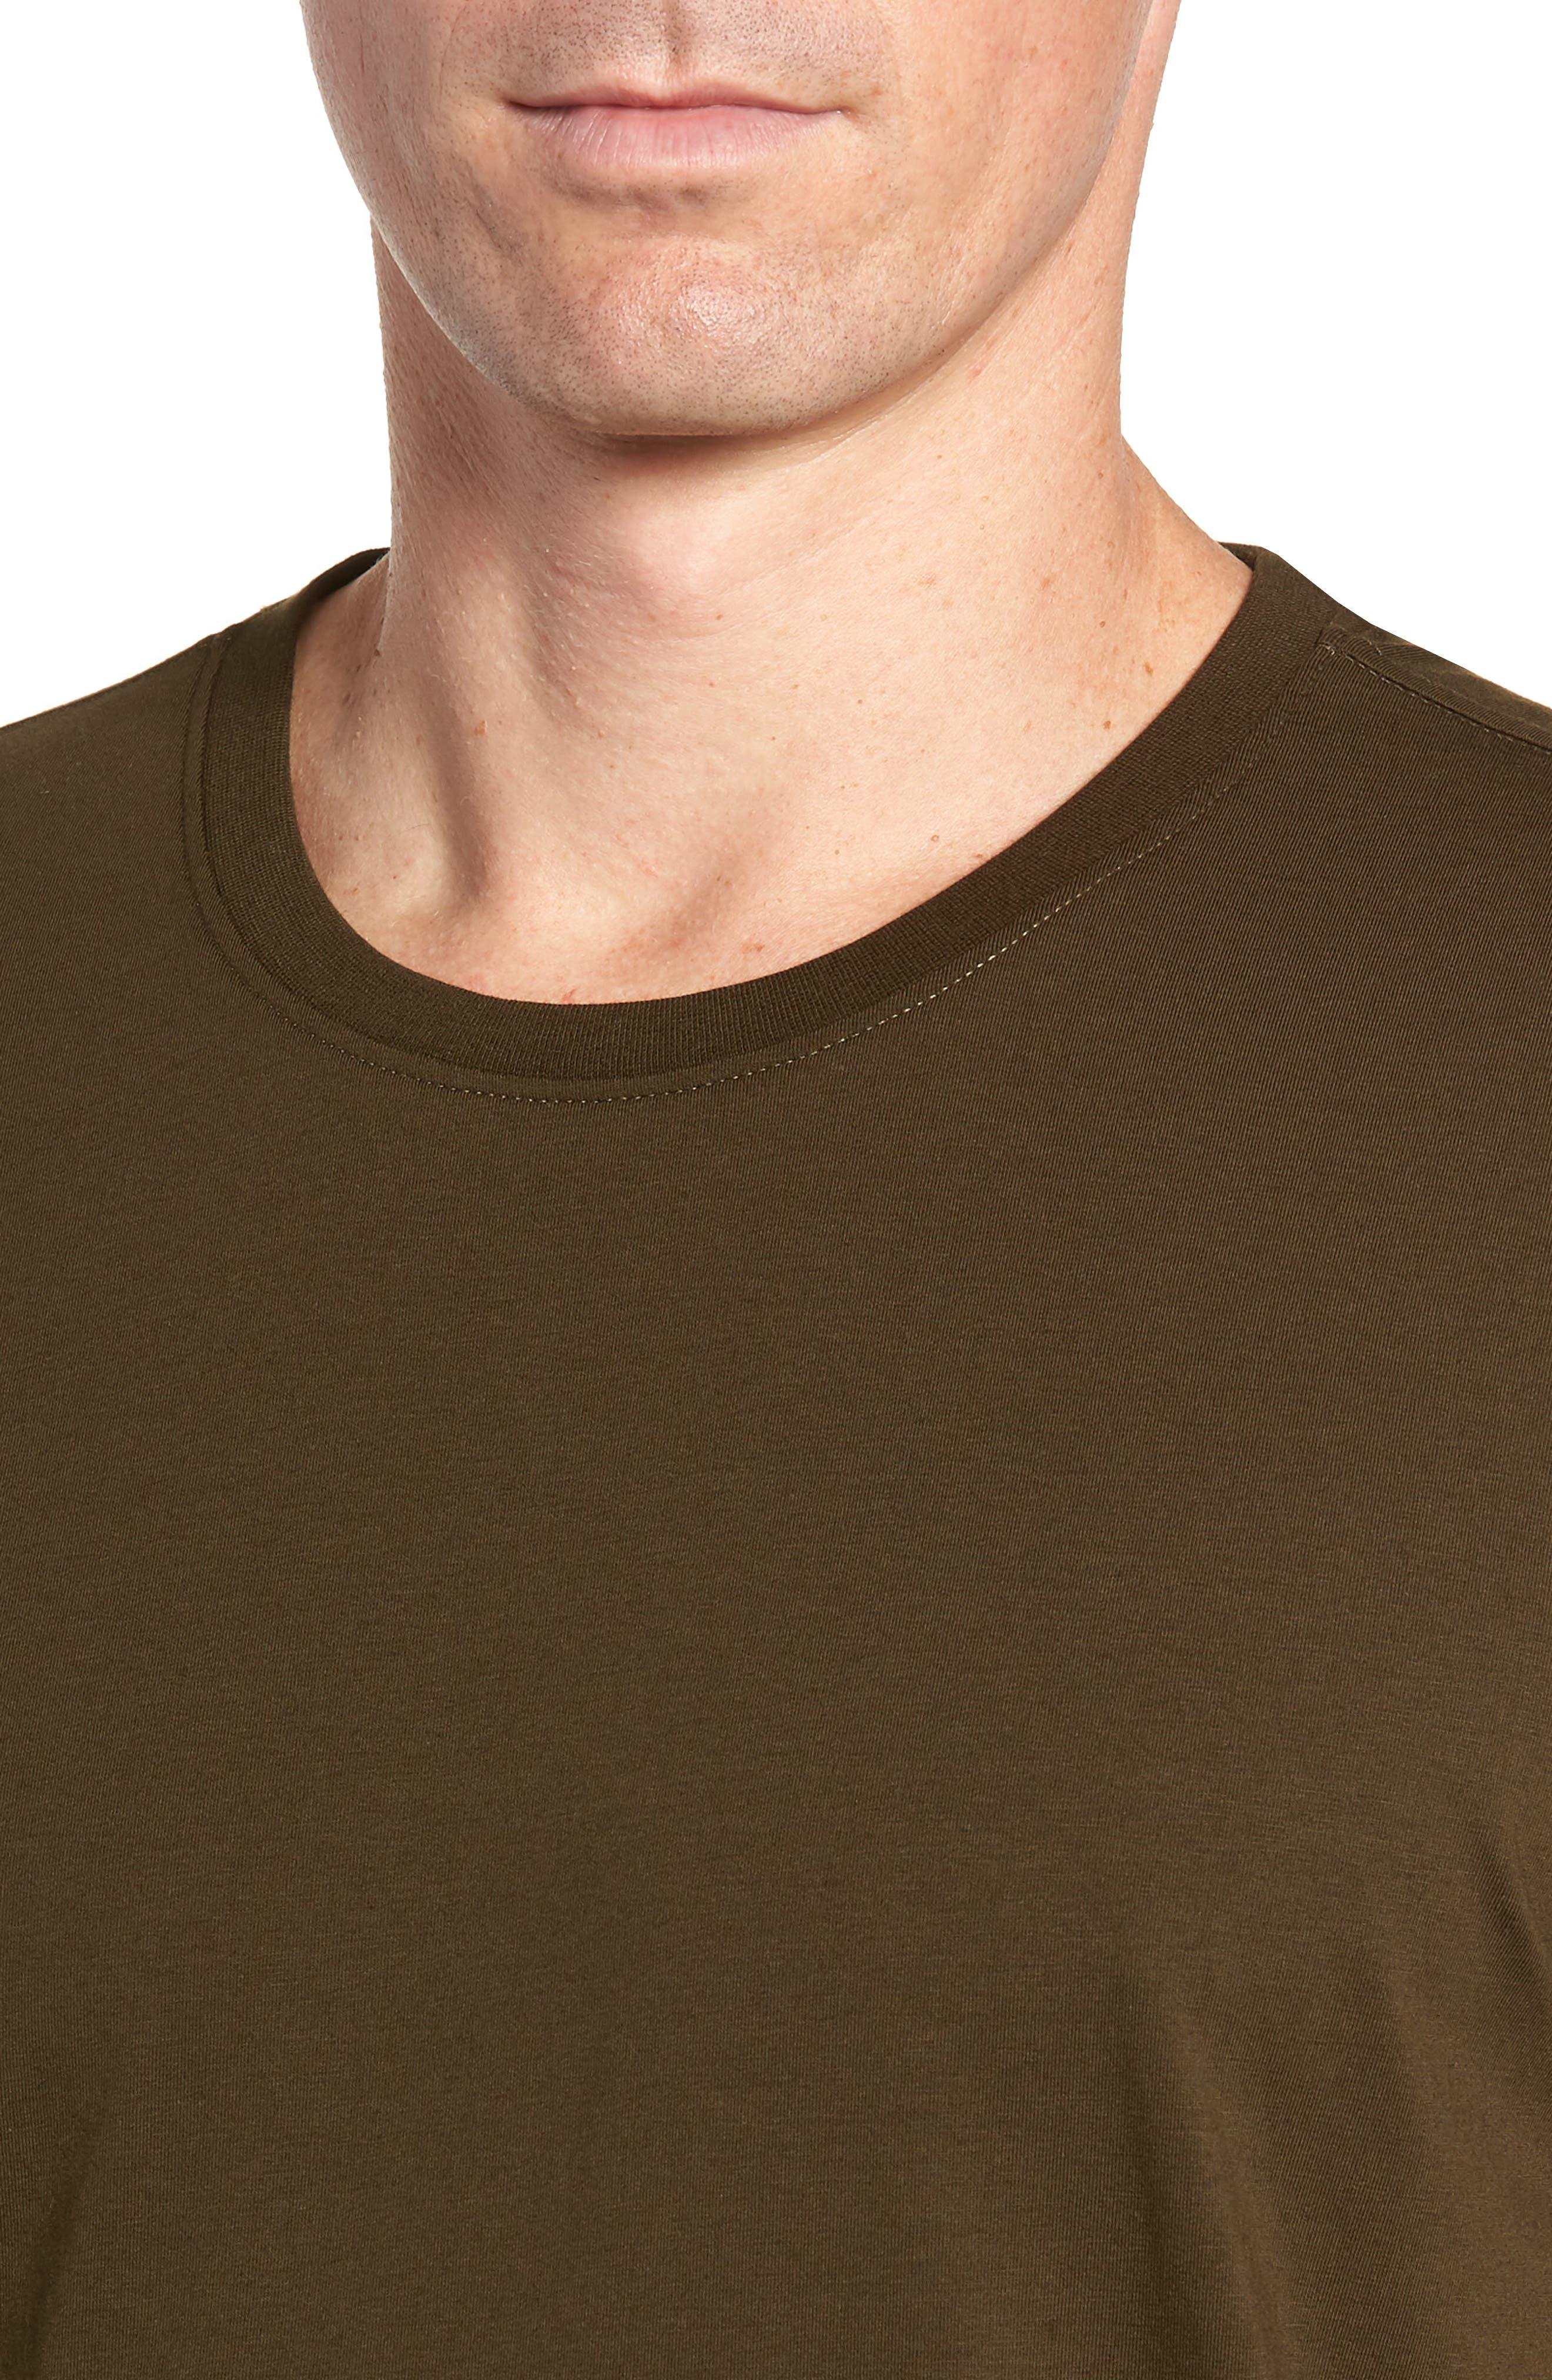 Stretch Cotton & Modal Crewneck T-Shirt,                             Alternate thumbnail 4, color,                             ARMY